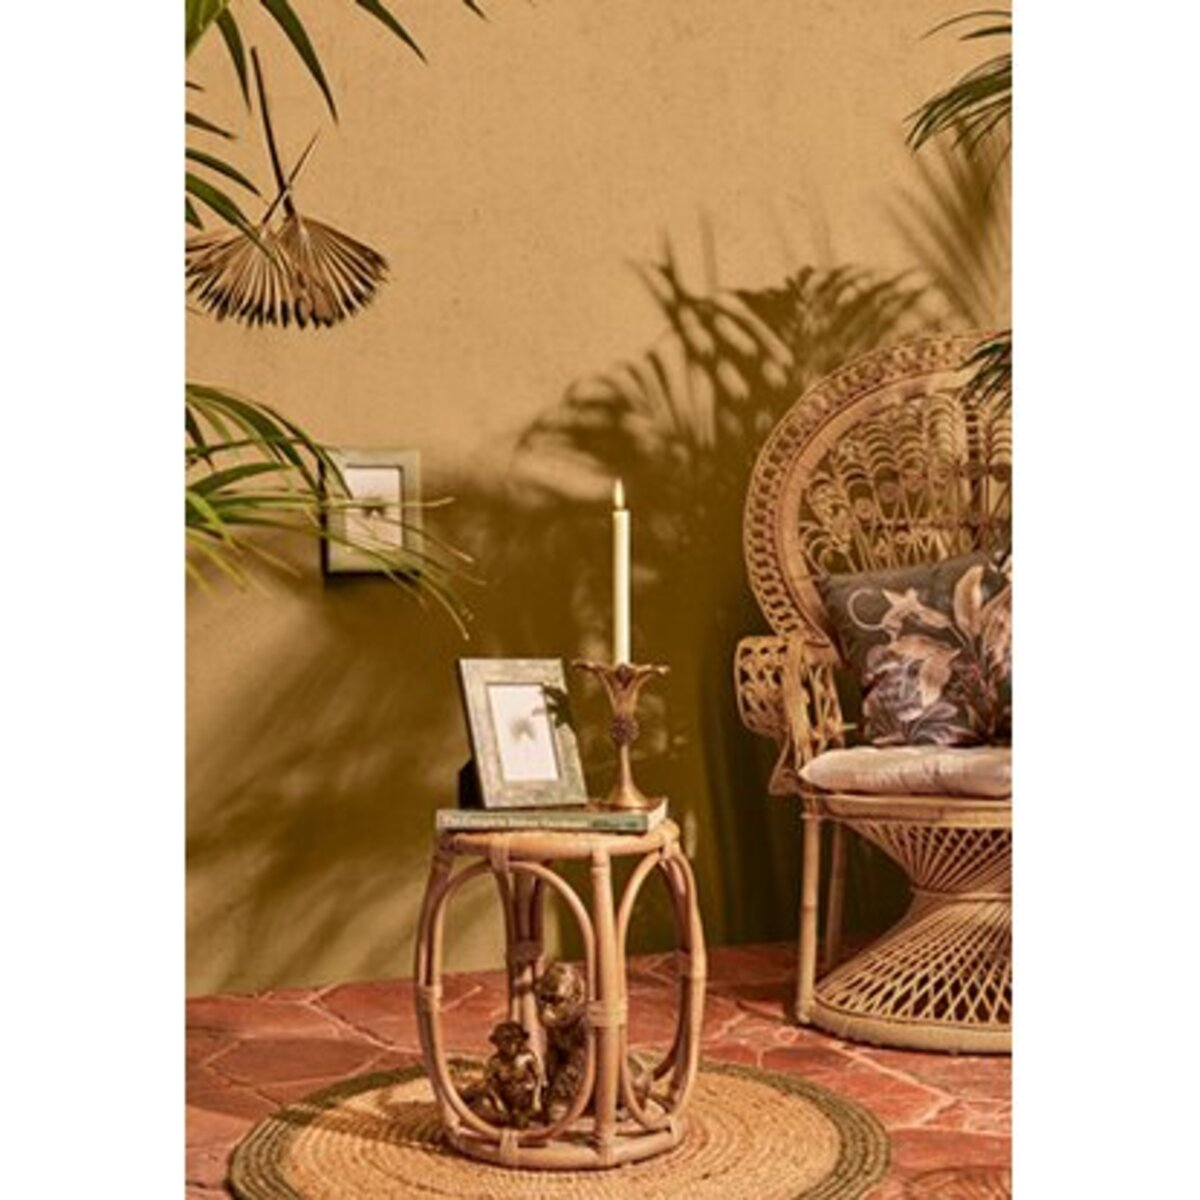 Bild 2 von Deko-Figur Gorilla Sitzend Safari Lodge 22 cm Gold